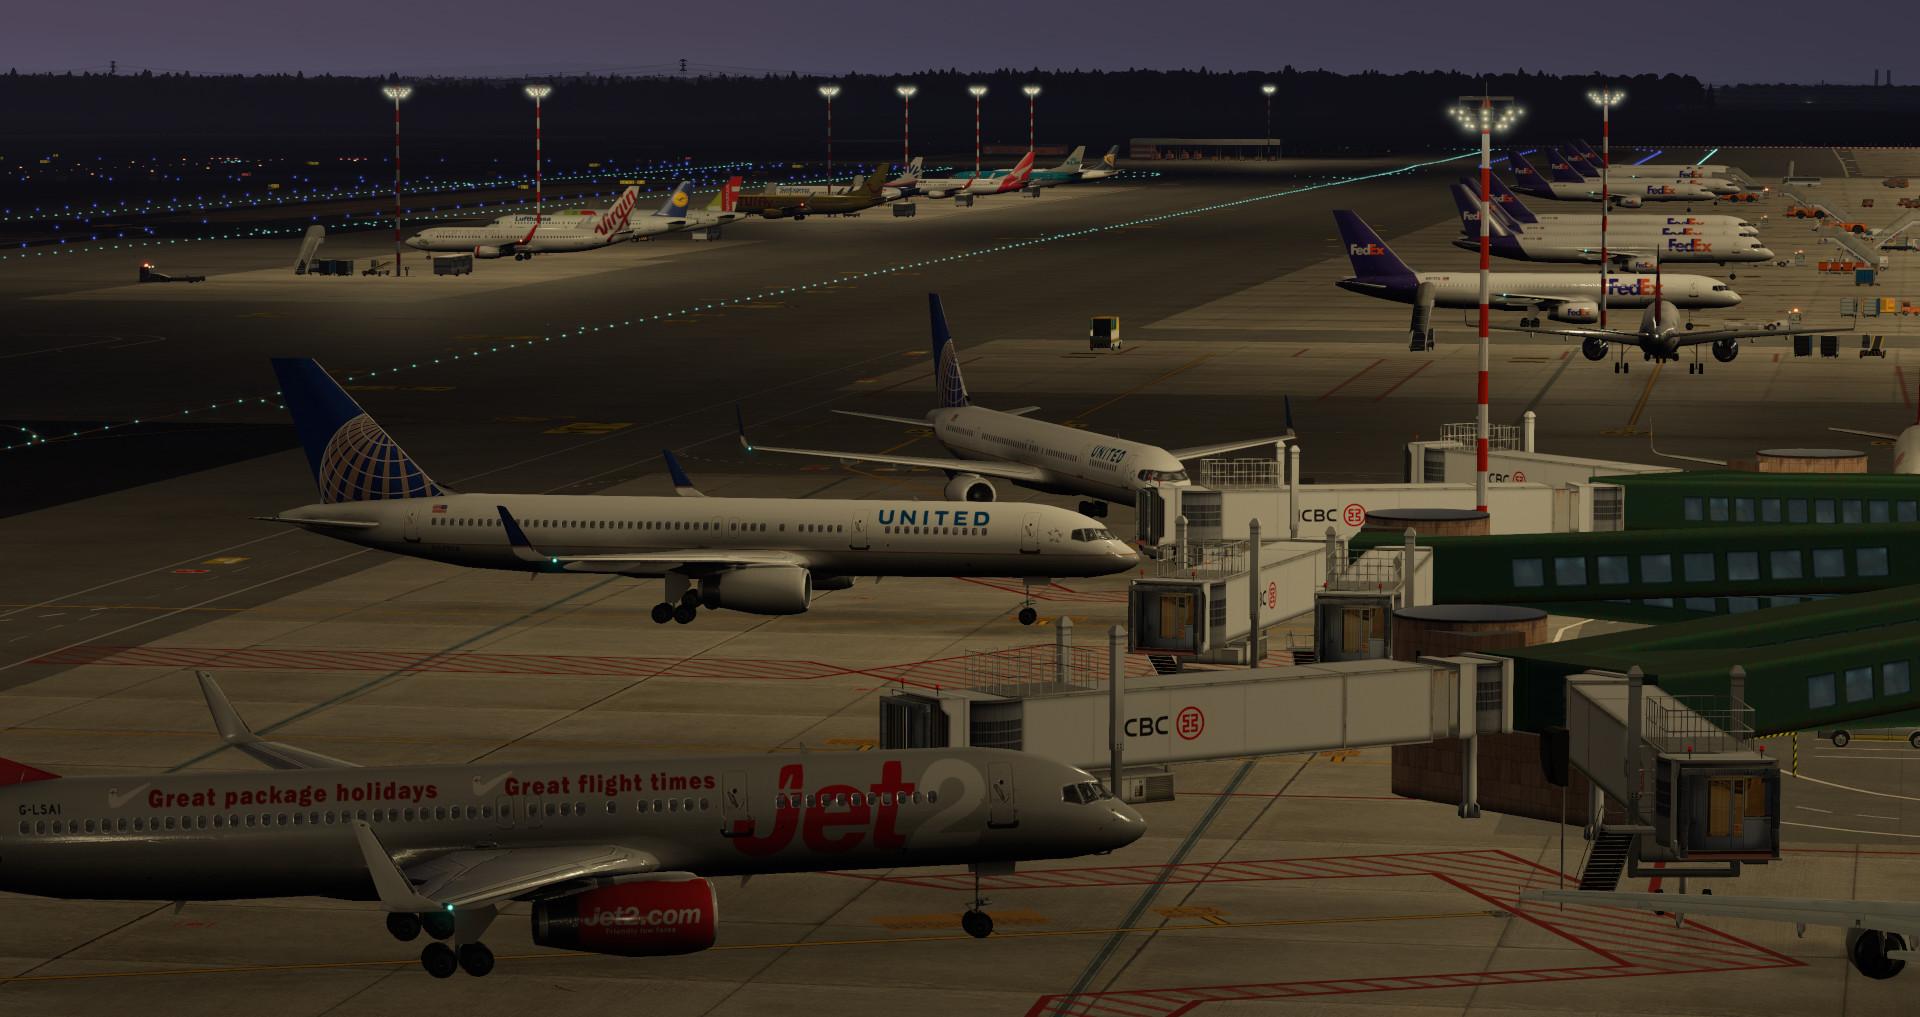 X-Plane 11 - Add-on: Aerosoft - Airport Milano Malpensa screenshot